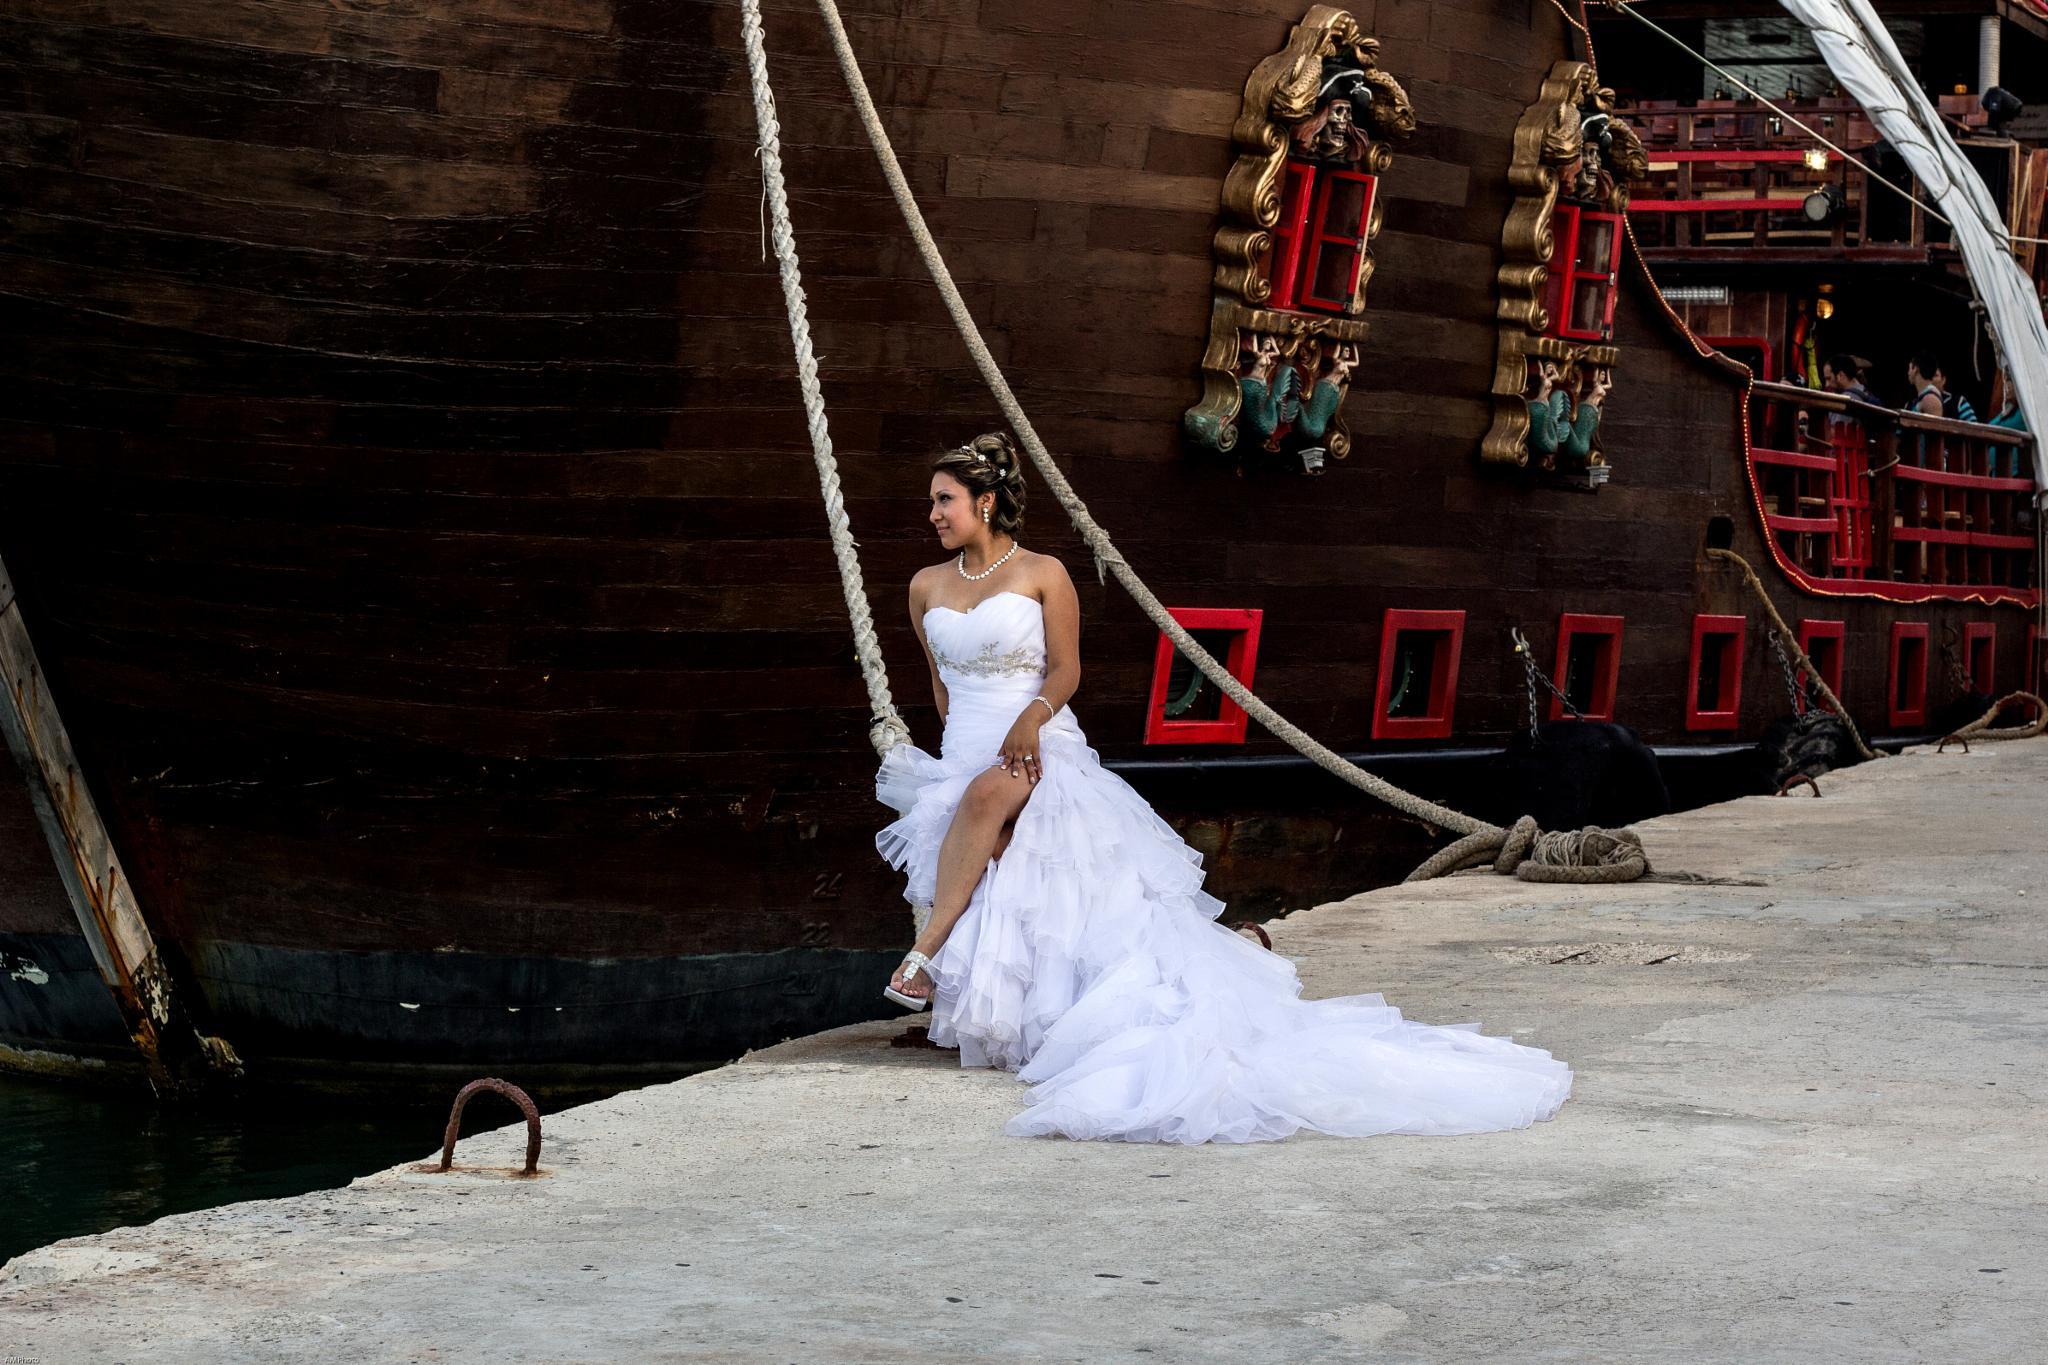 Pirat Boat Bride in Cancún by AlexMelendezPhoto